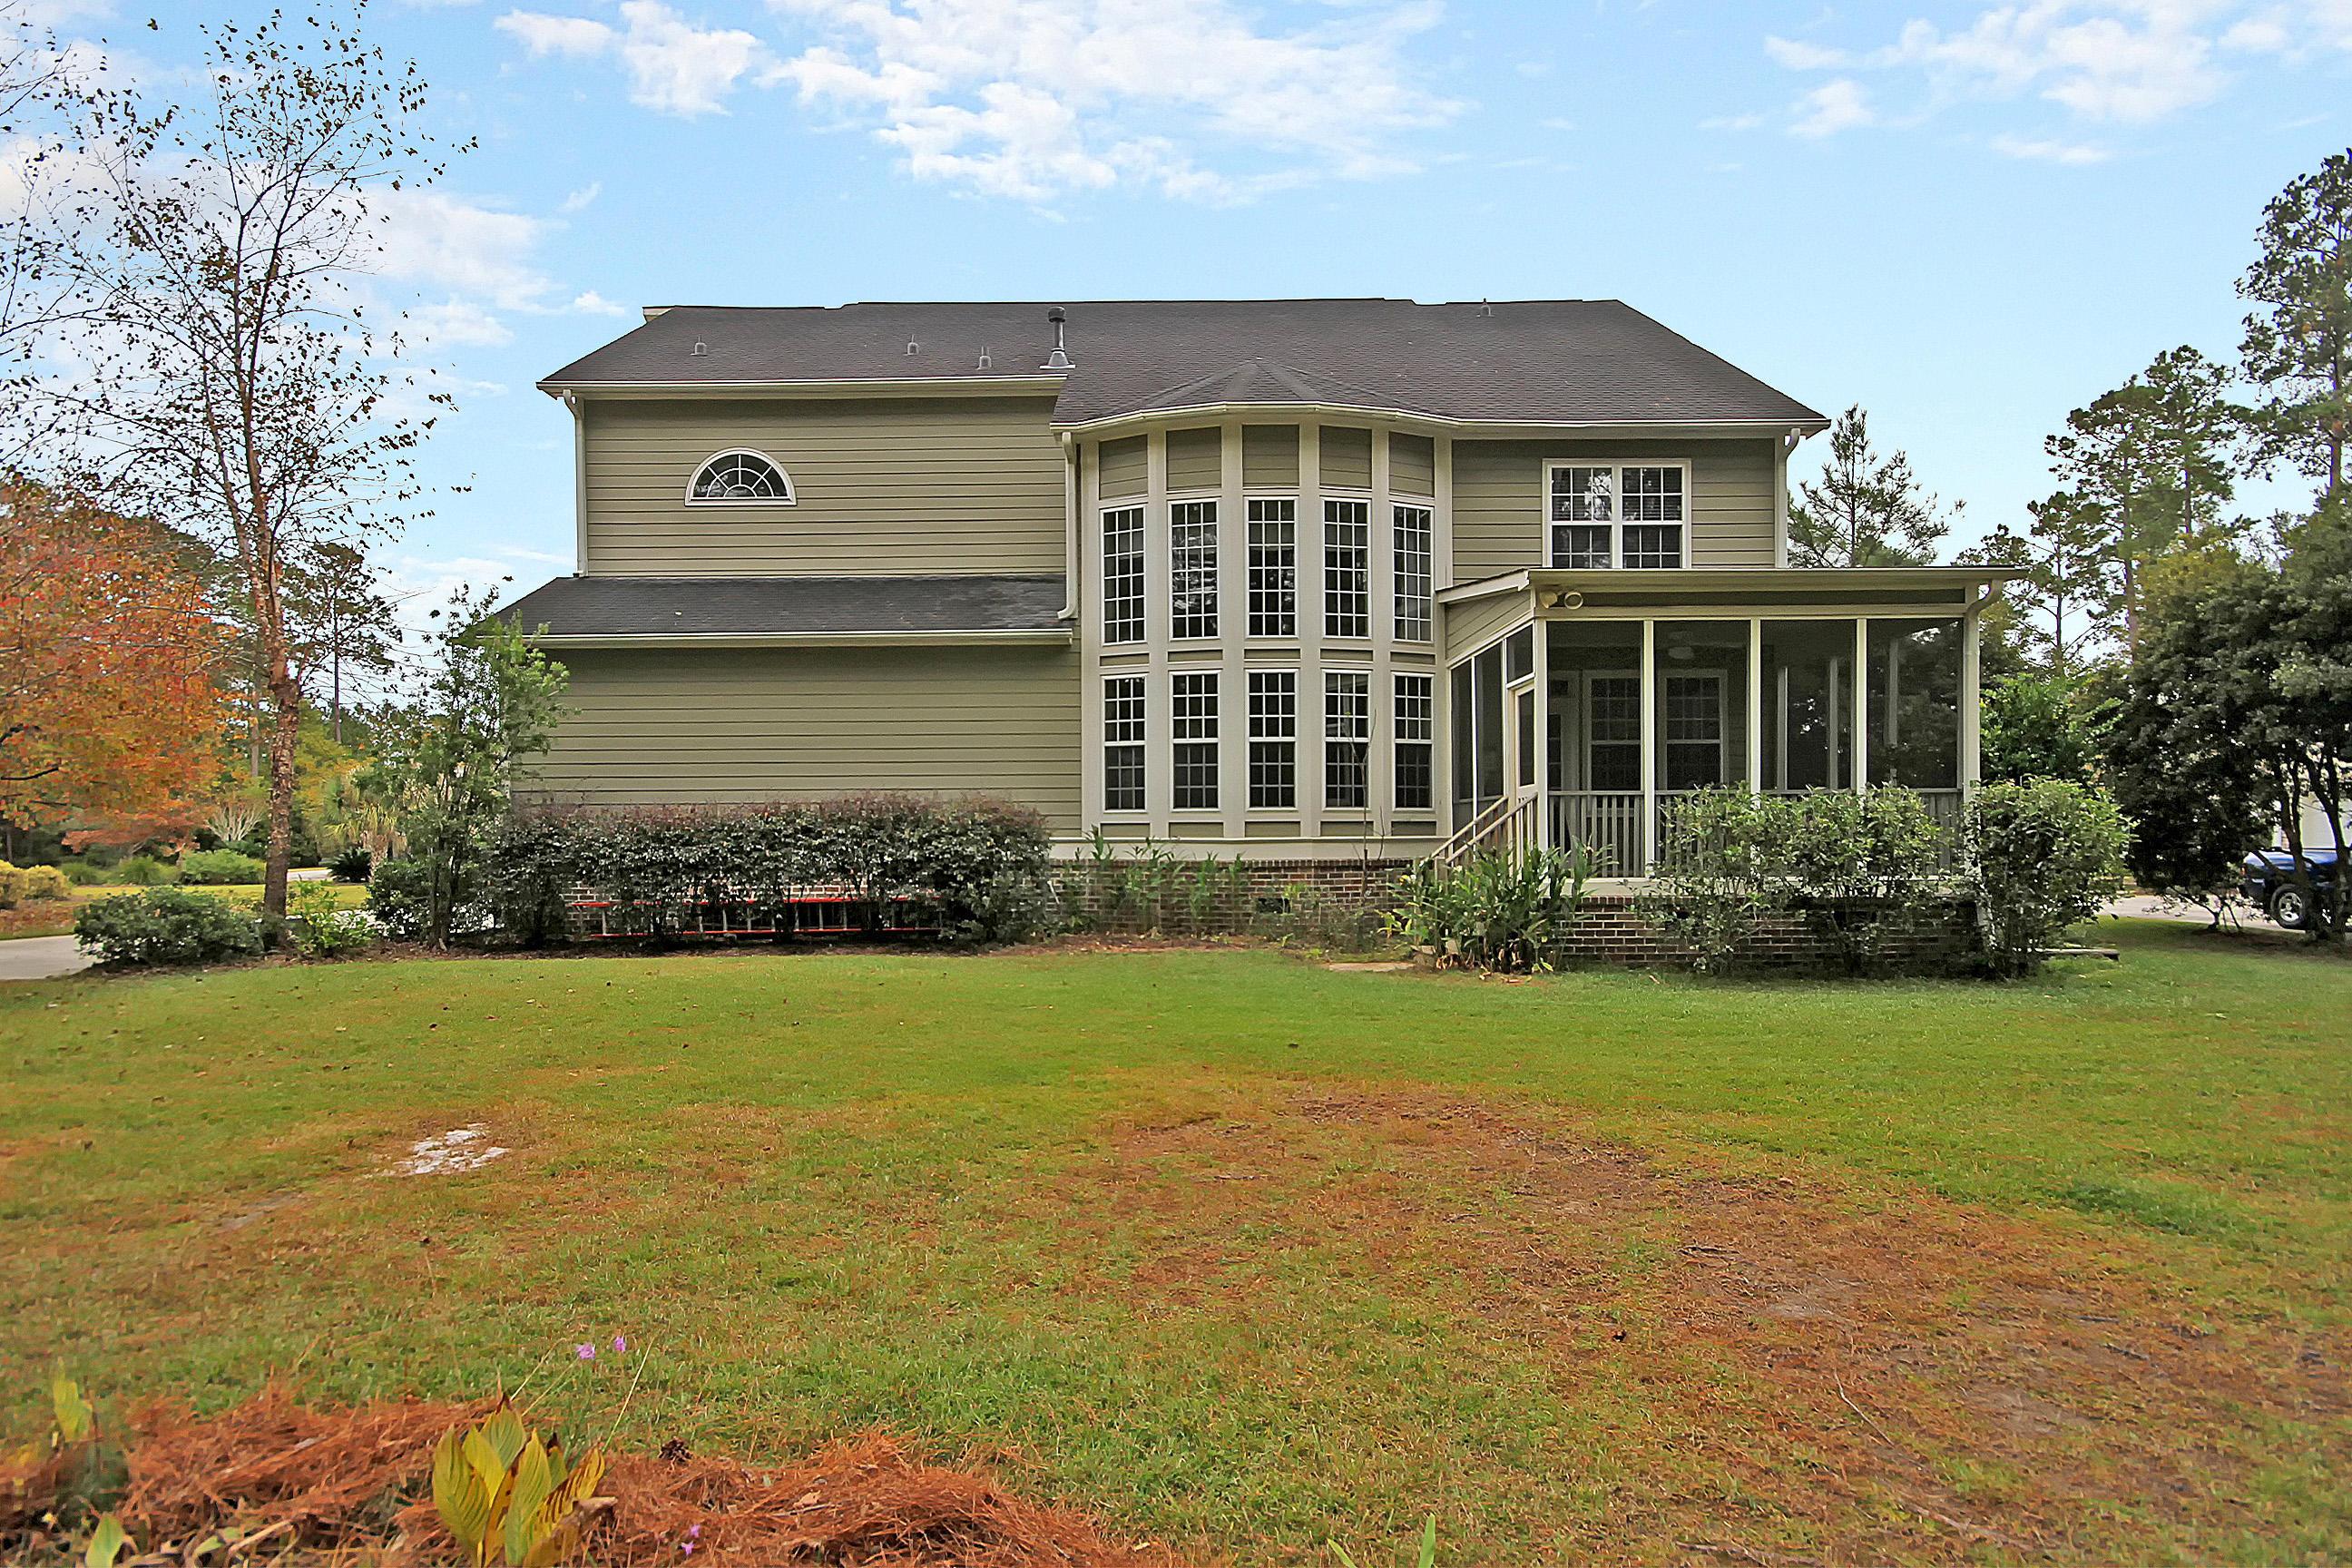 Dunes West Homes For Sale - 2449 Darts Cove, Mount Pleasant, SC - 10